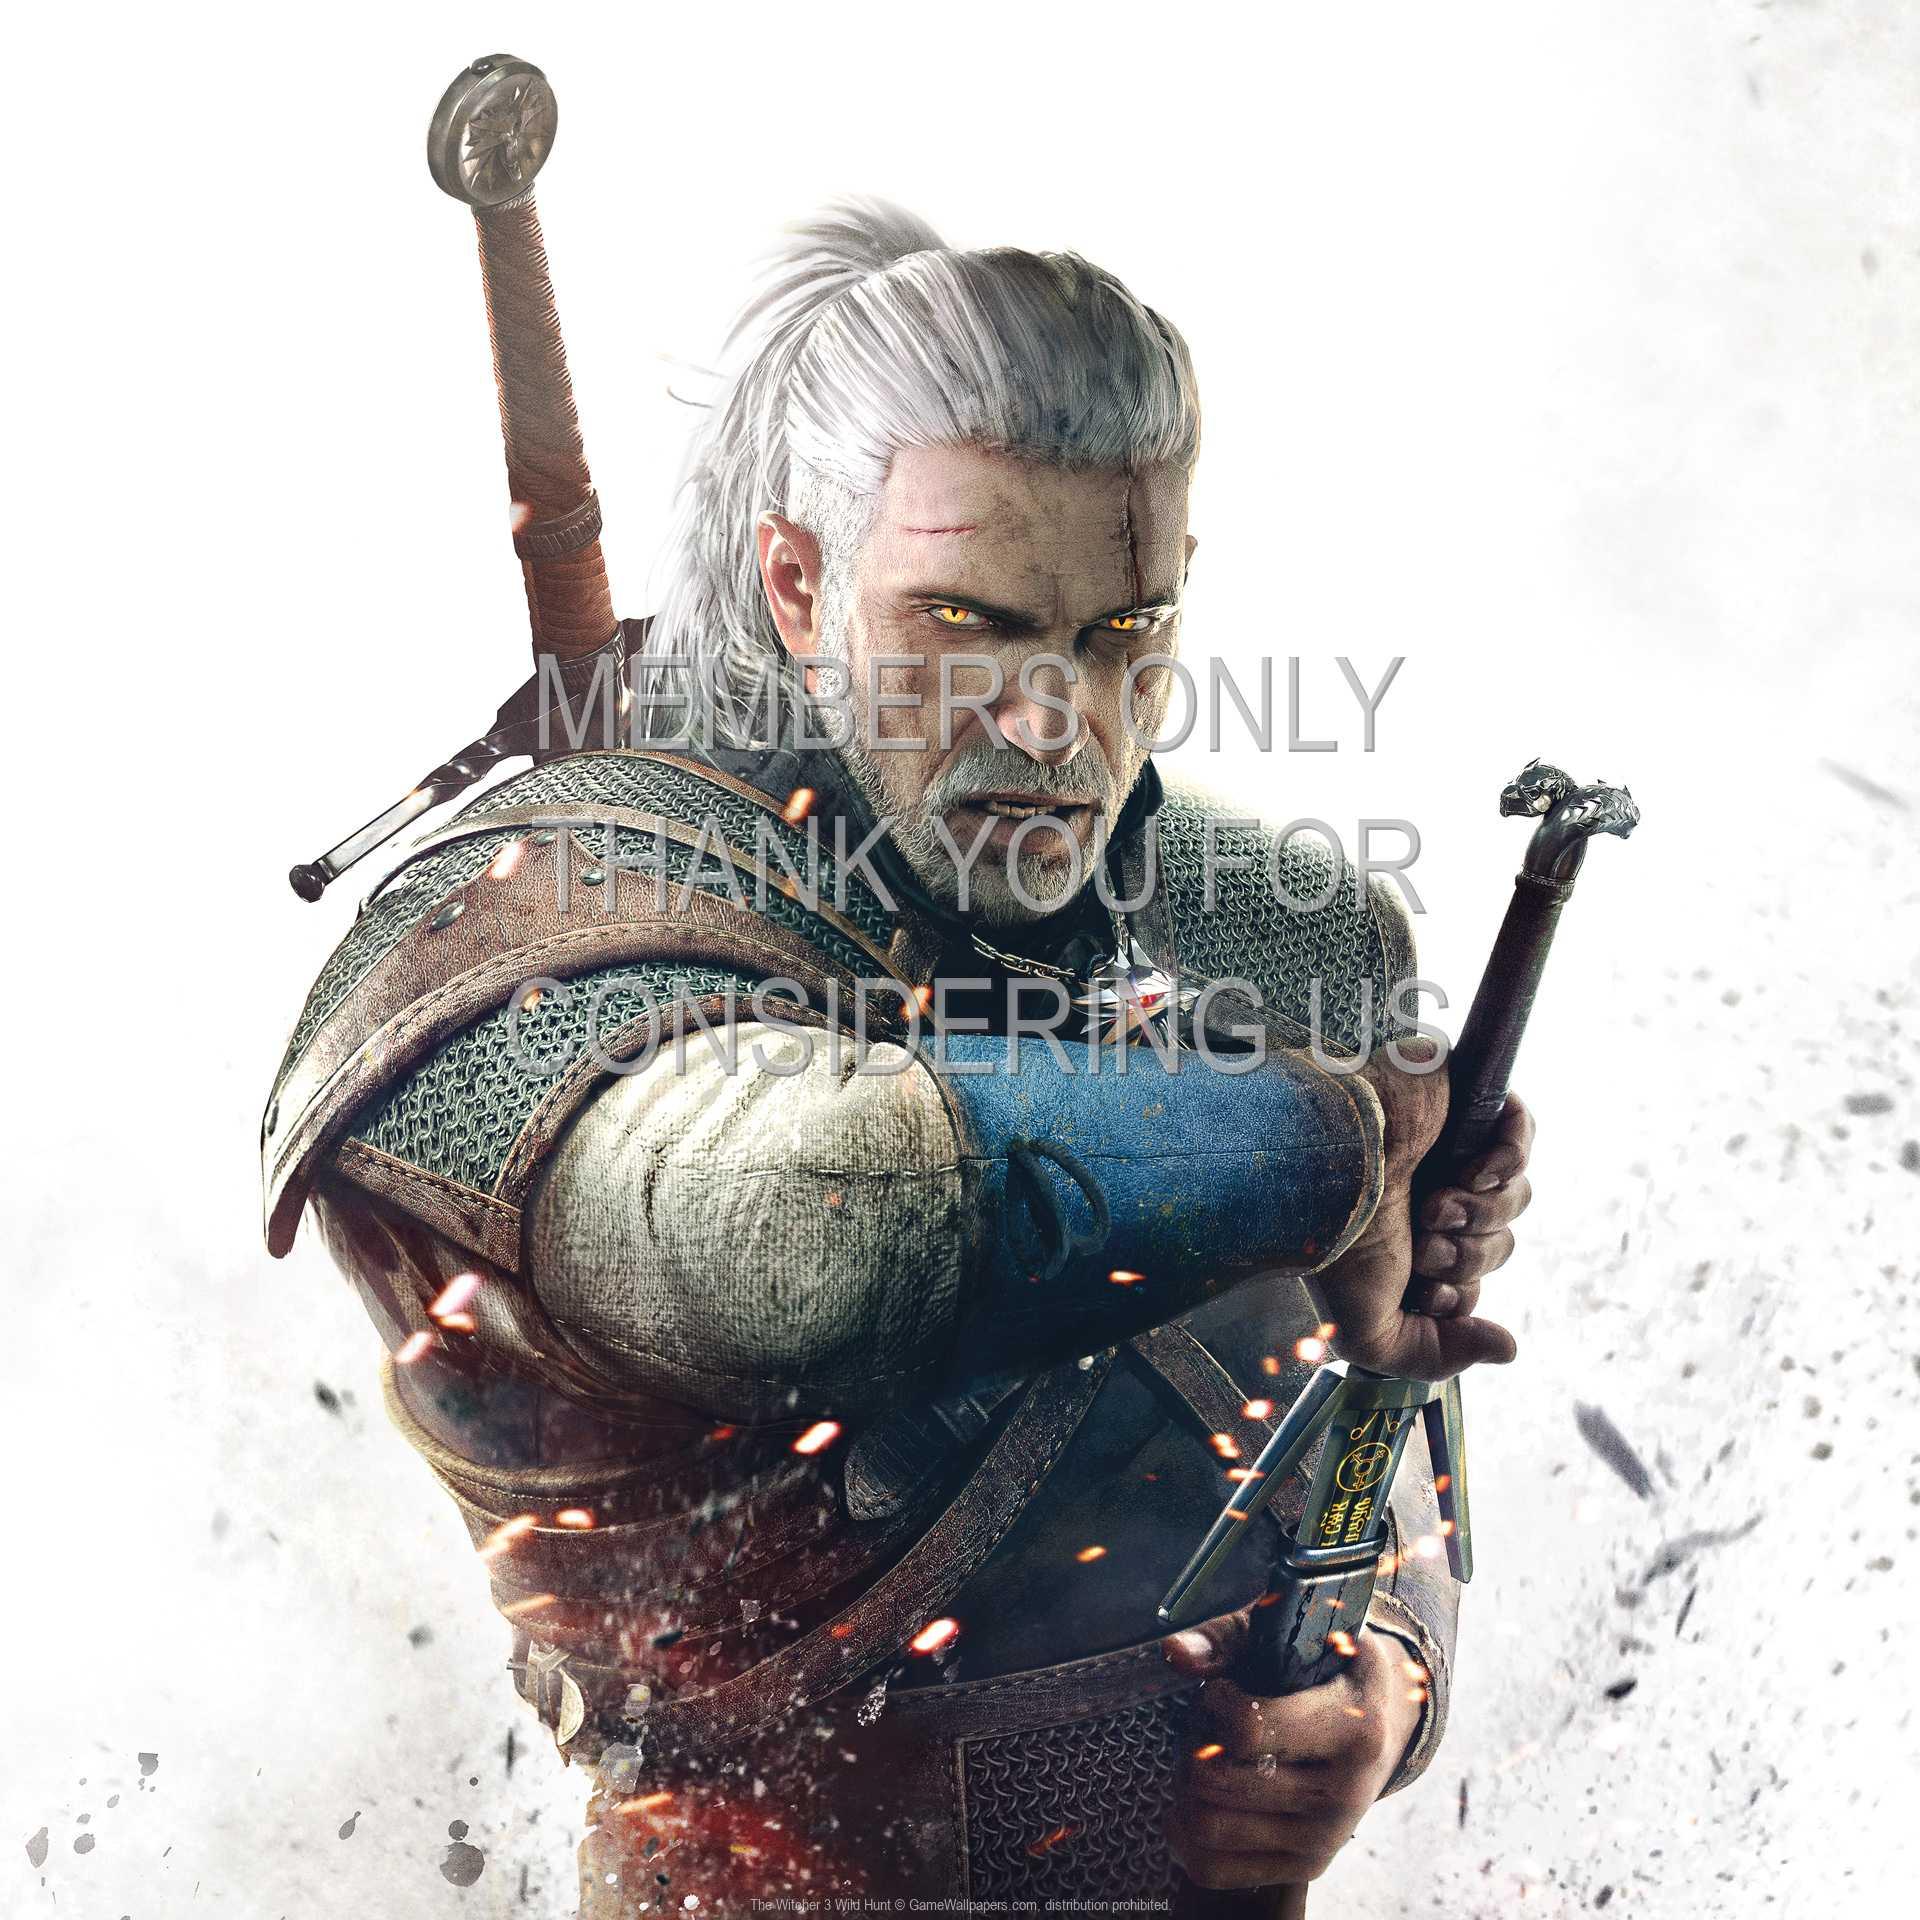 The Witcher 3: Wild Hunt 1080p Horizontal Handy Hintergrundbild 16